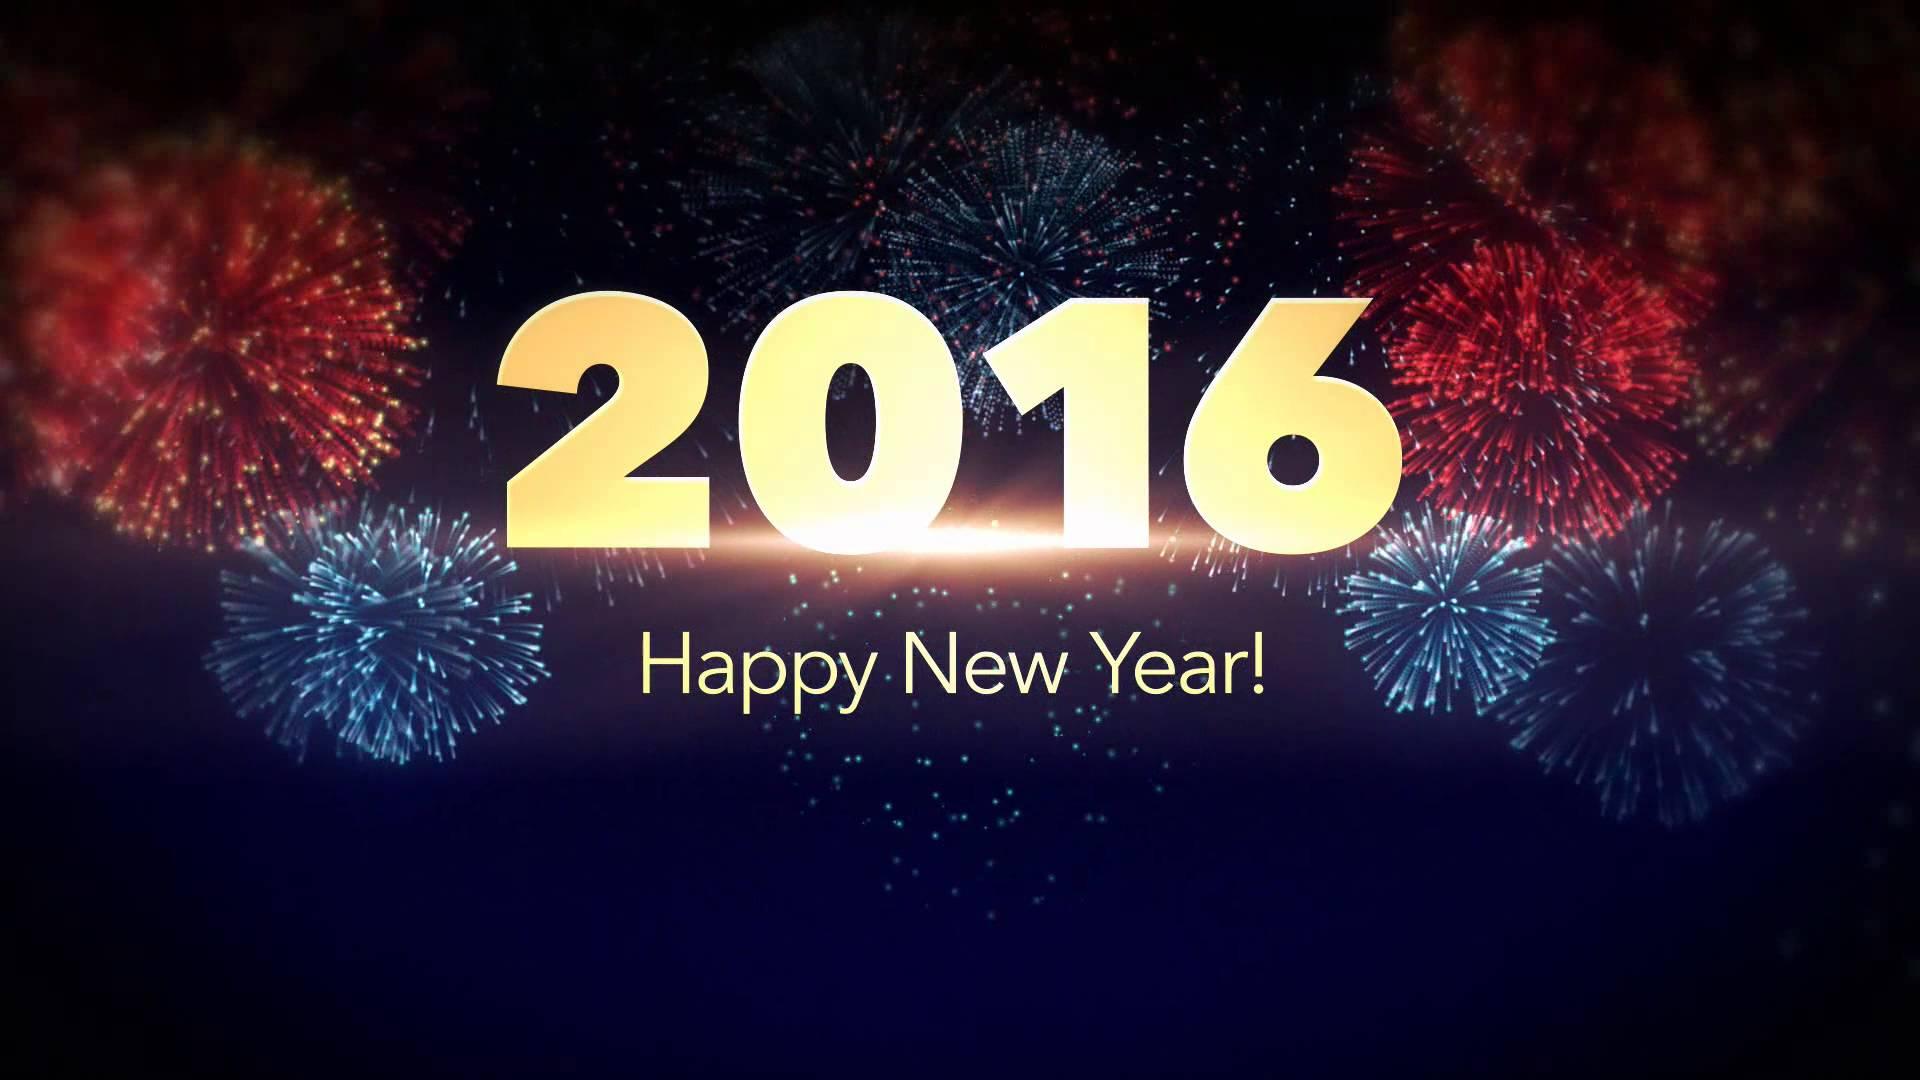 latest-happy-new-year-2016-photos